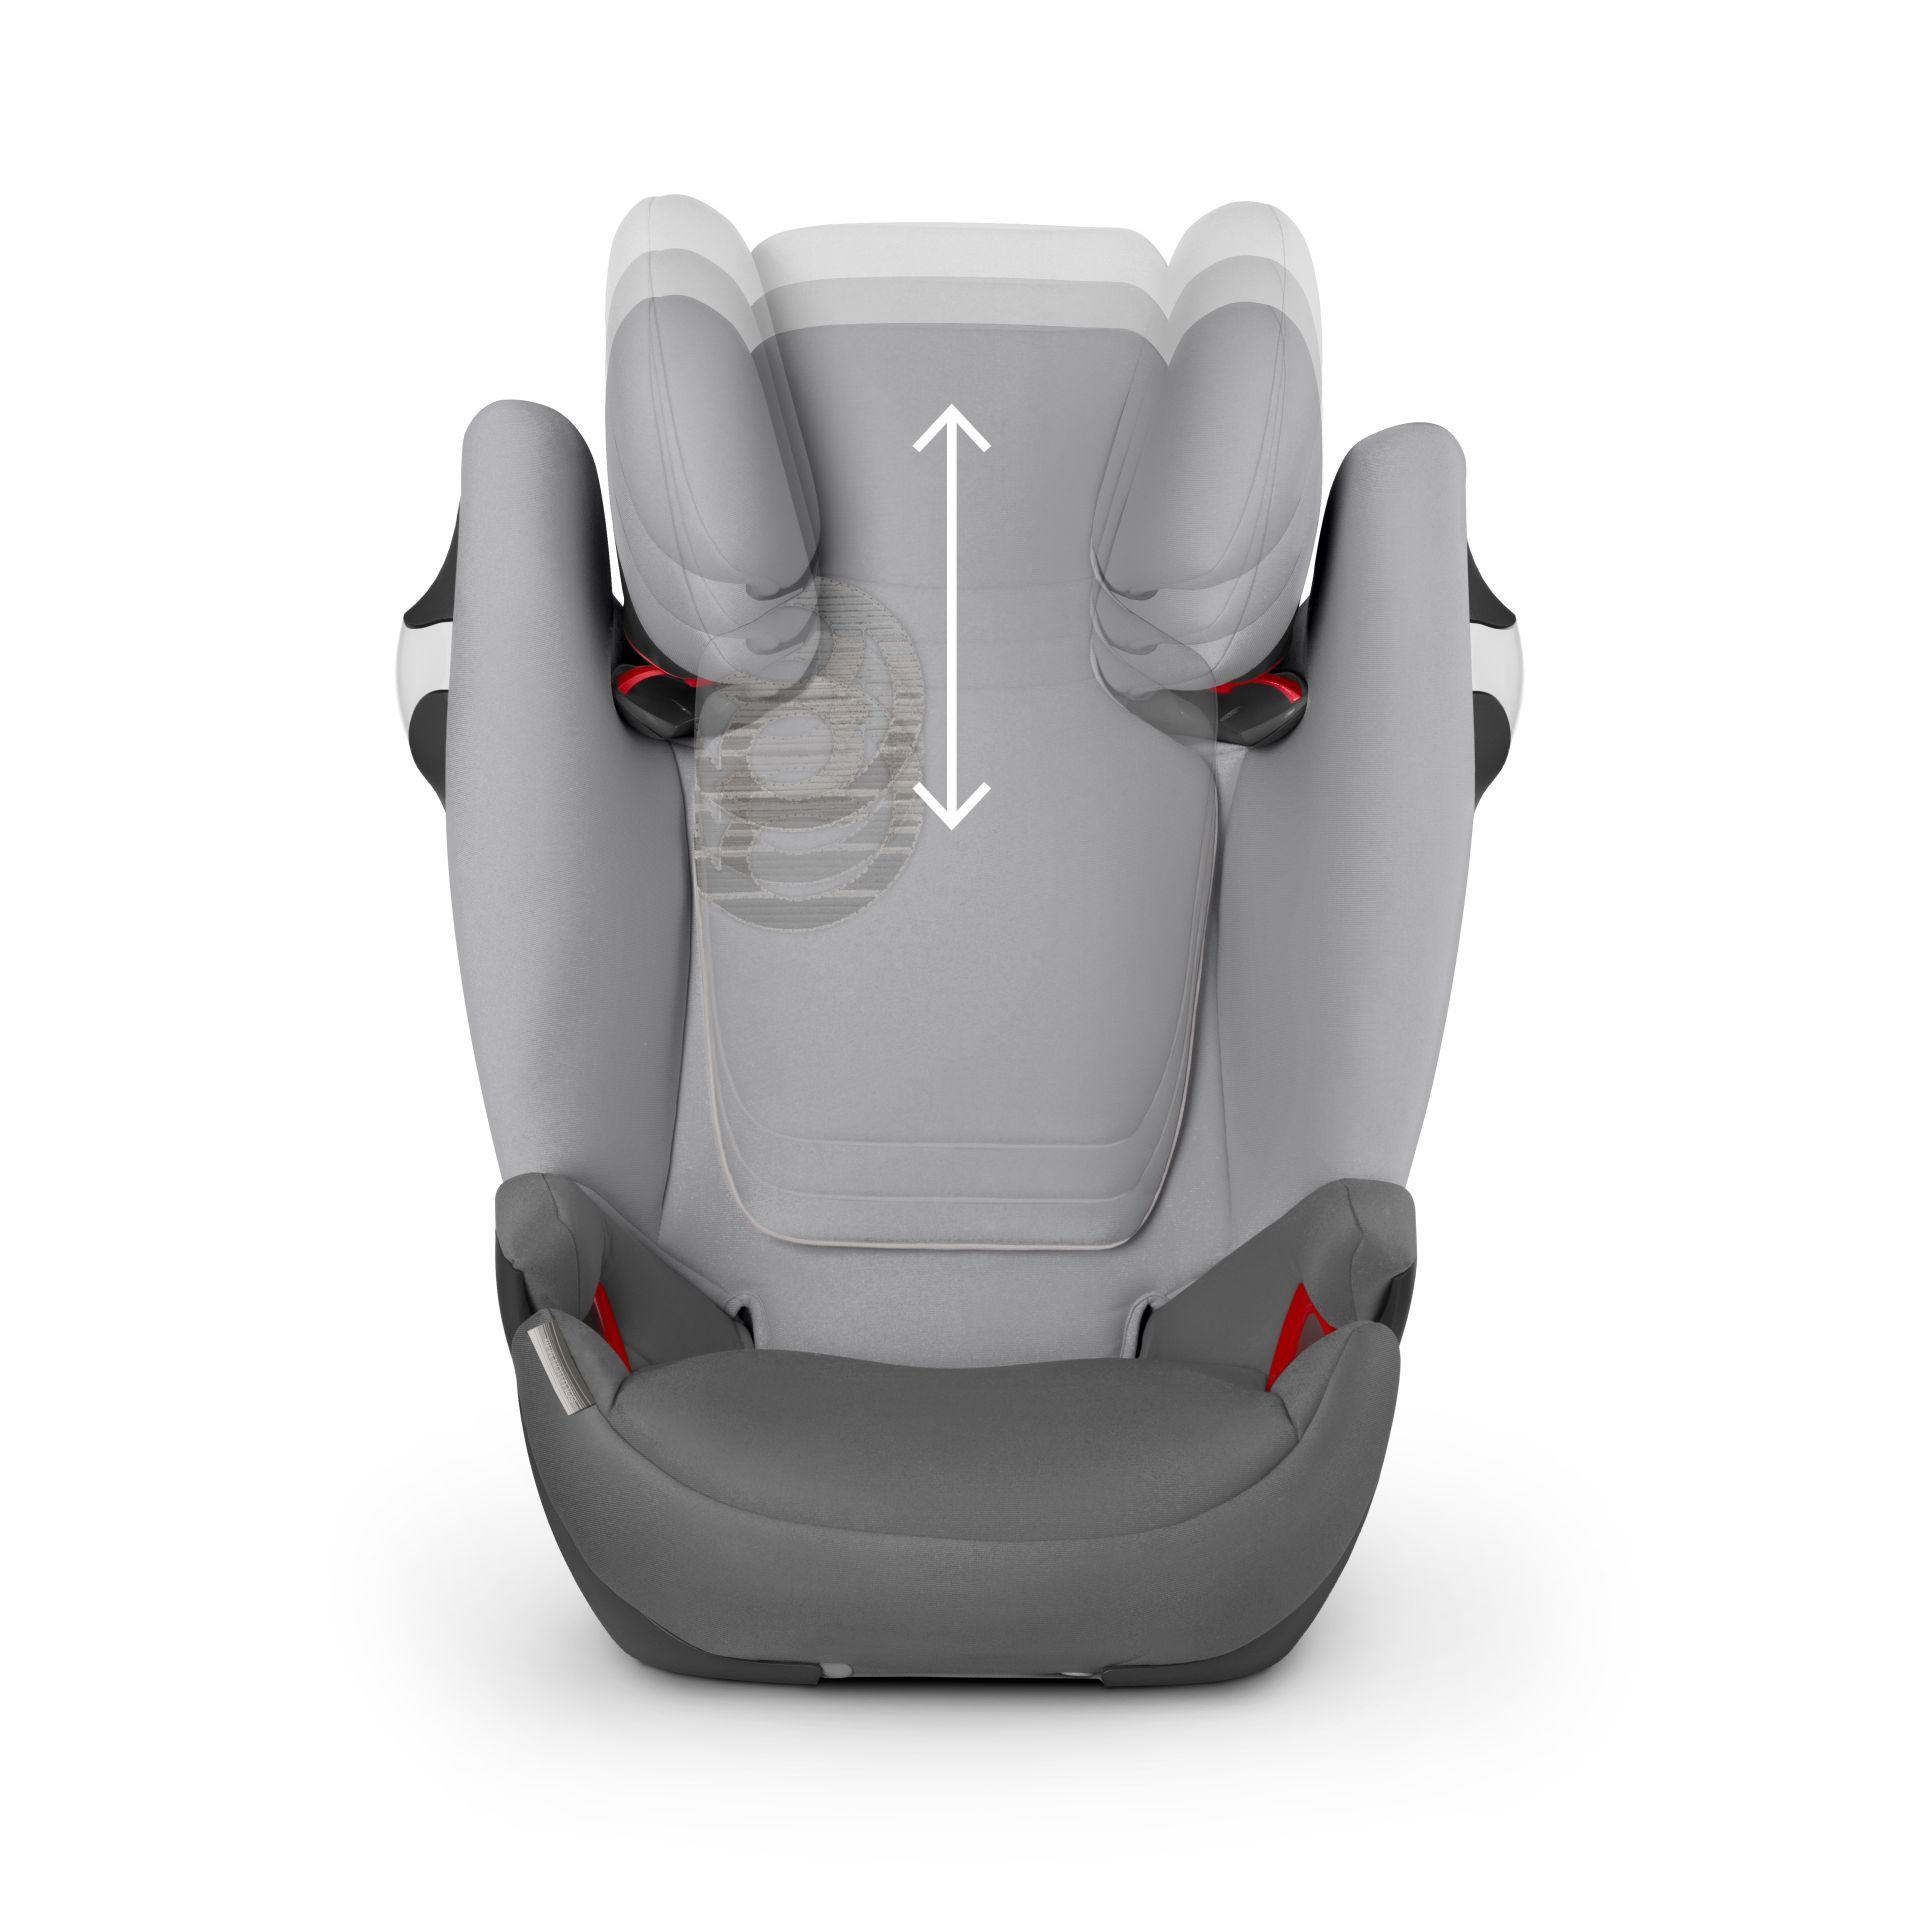 cybex child car seat solution m fix buy at kidsroom. Black Bedroom Furniture Sets. Home Design Ideas